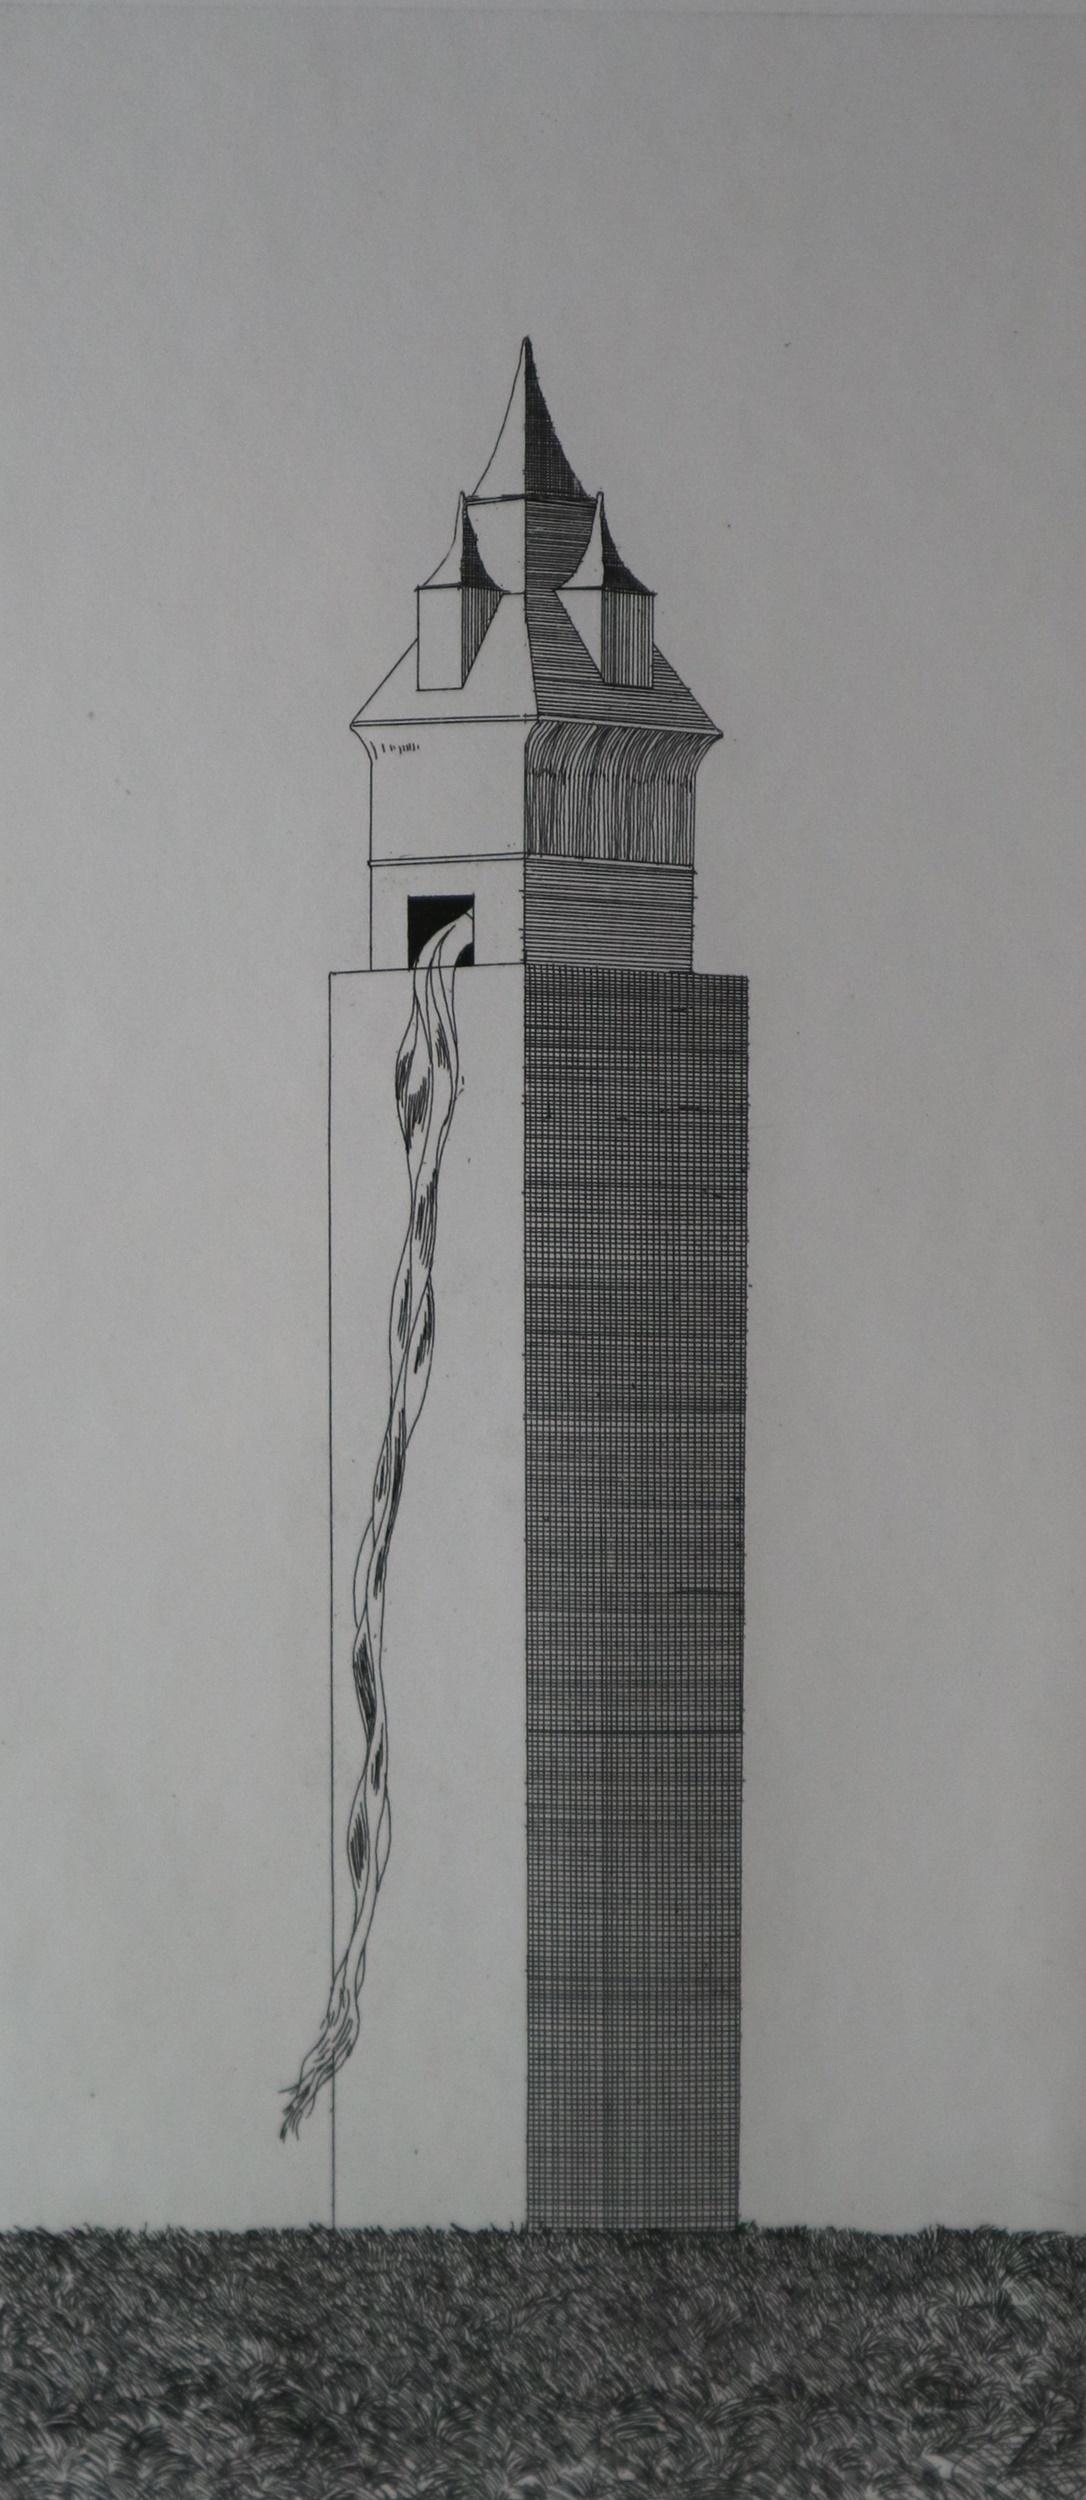 -The Tower Had One Window £1,000-£2,000